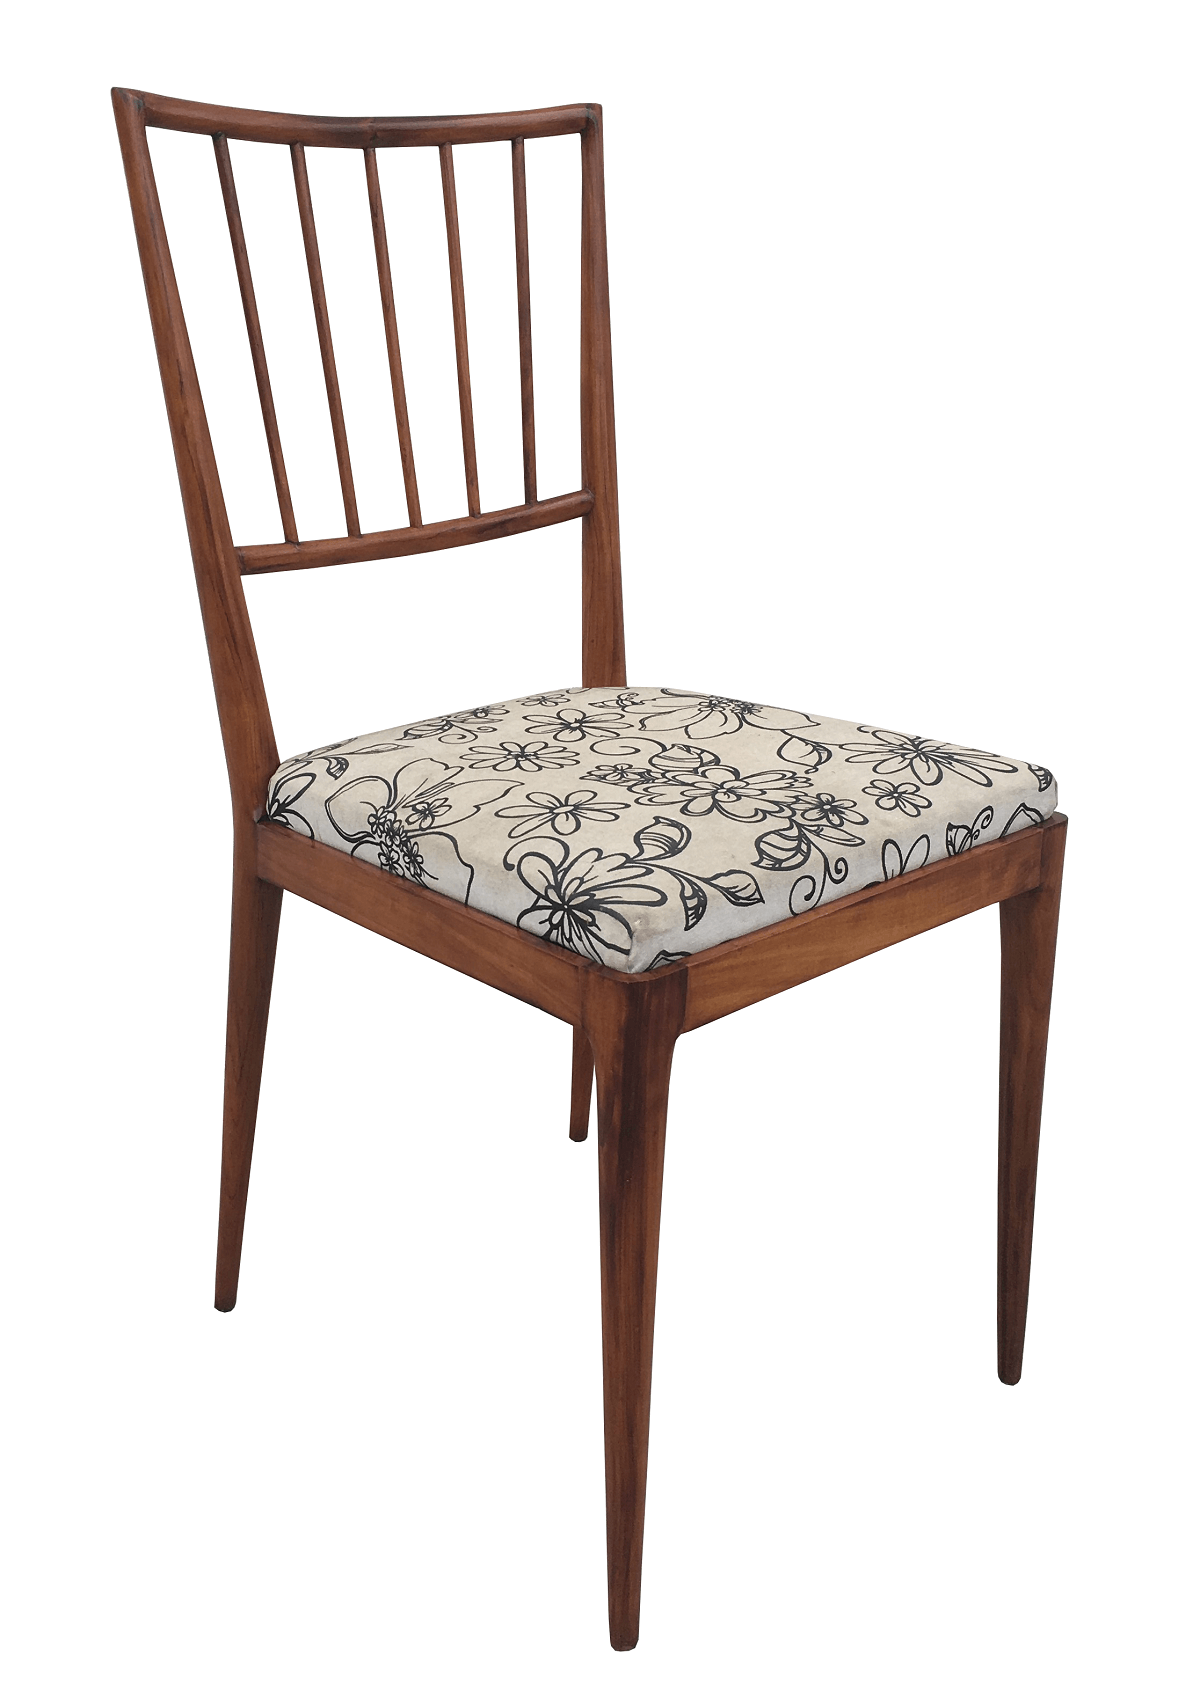 Cadeira Antiga Scapinelli Ou Geraldo De Barros Design Anos 60